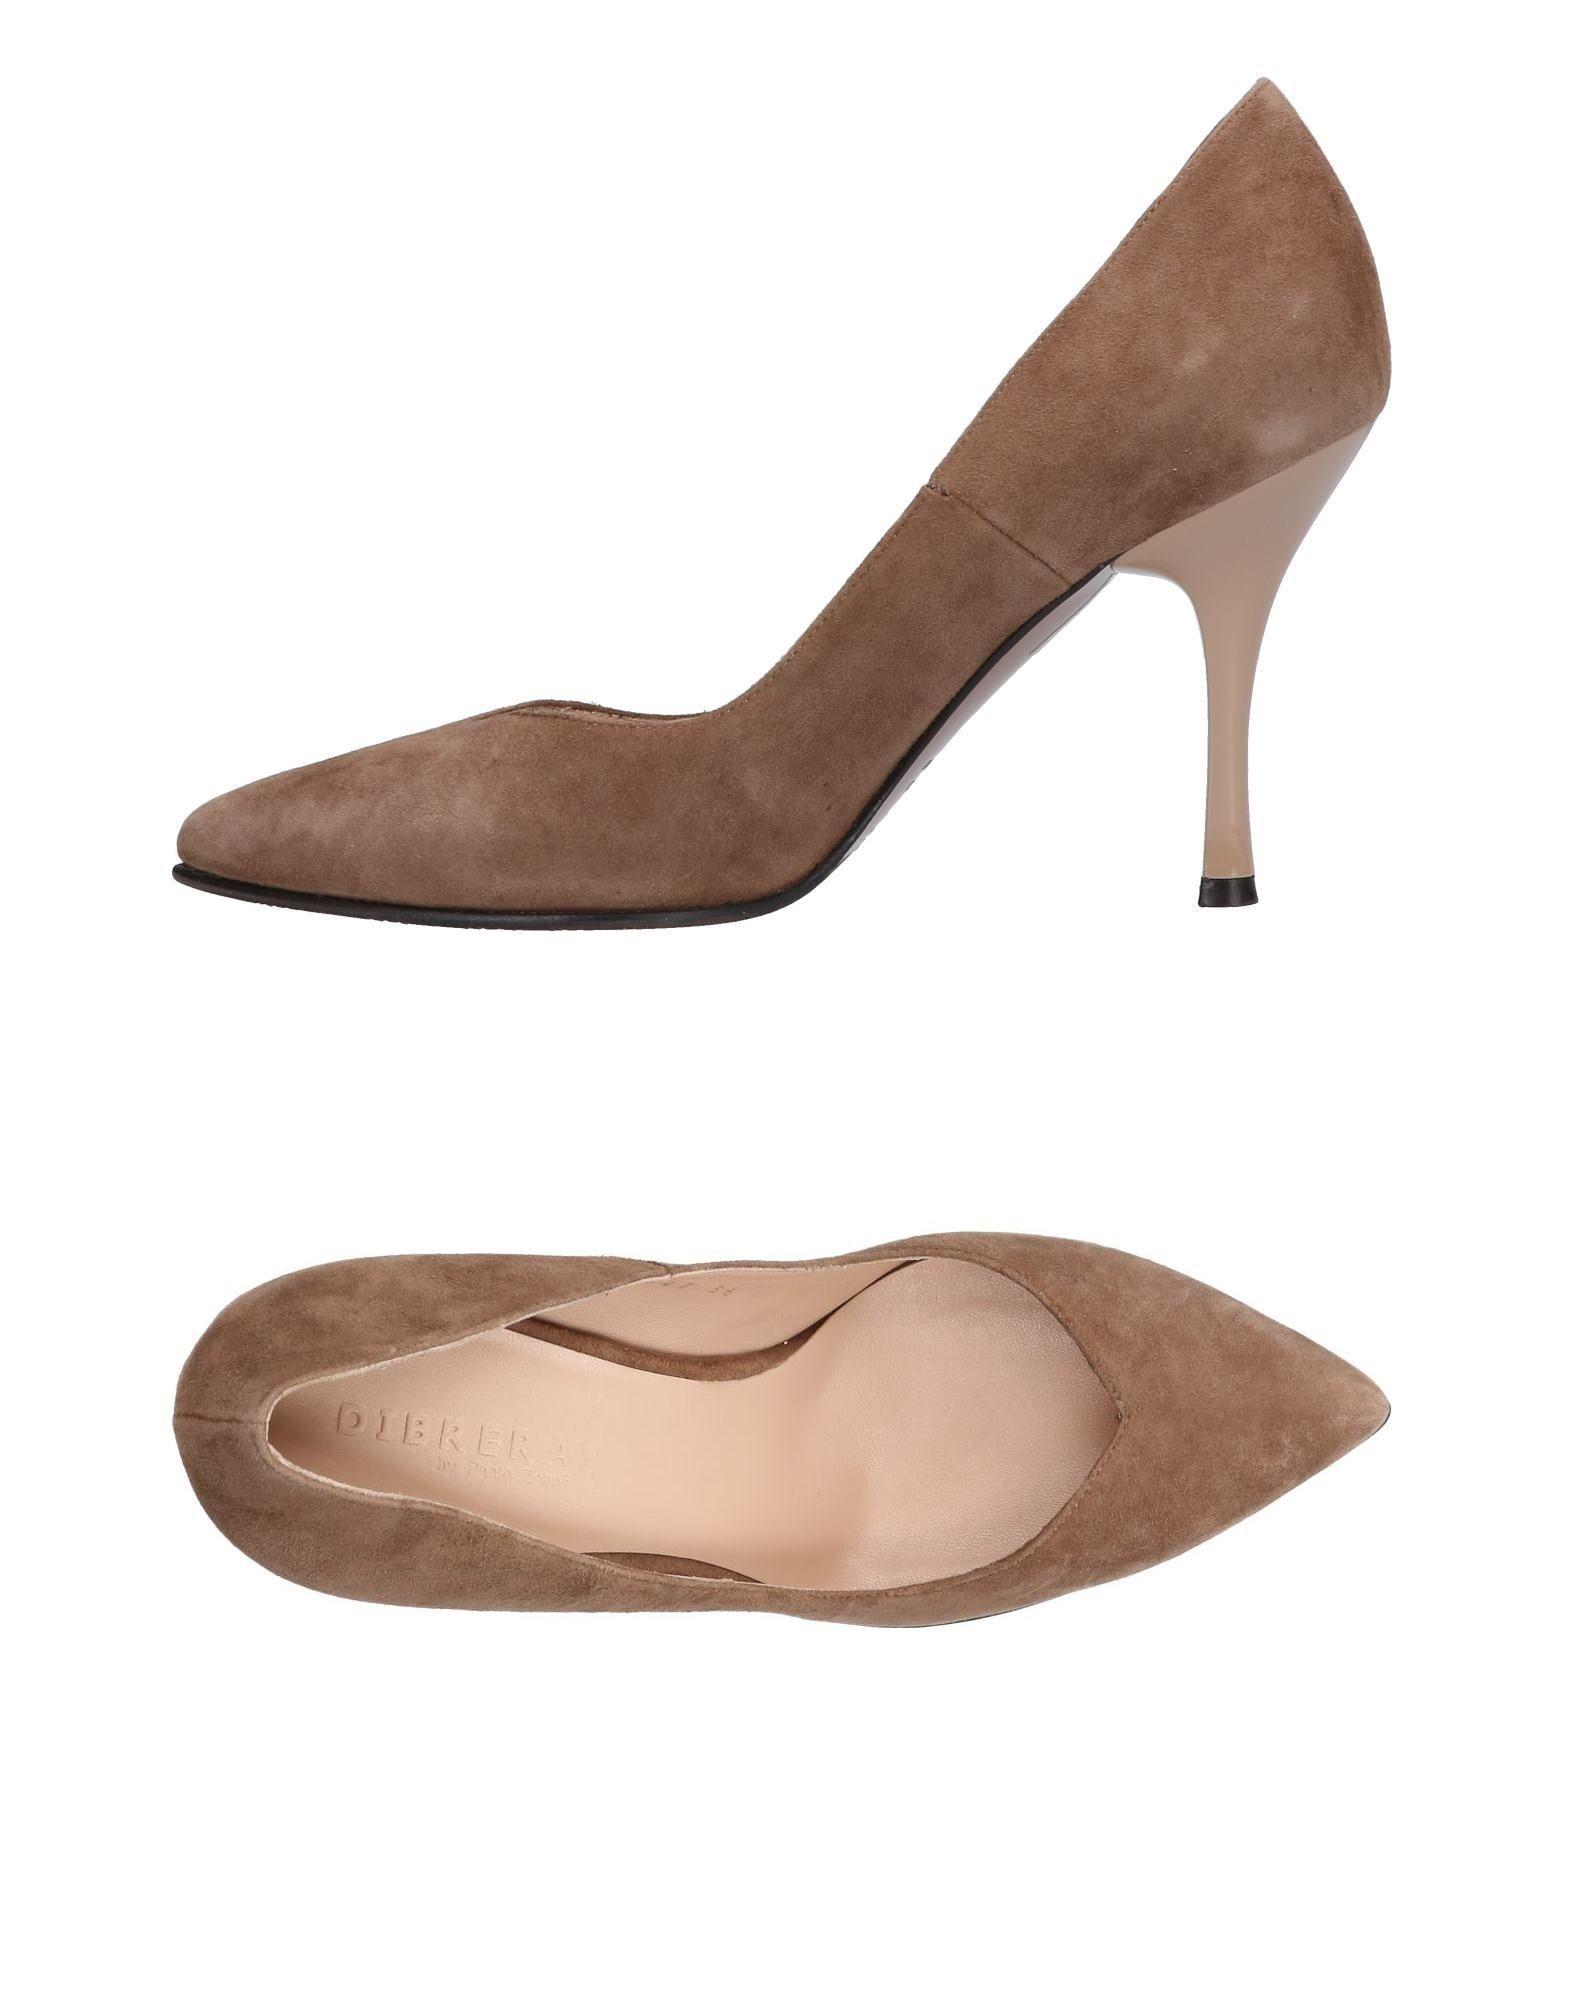 Rabatt Schuhe Dibrera By Paolo Zanoli Pumps Damen  11081252TD